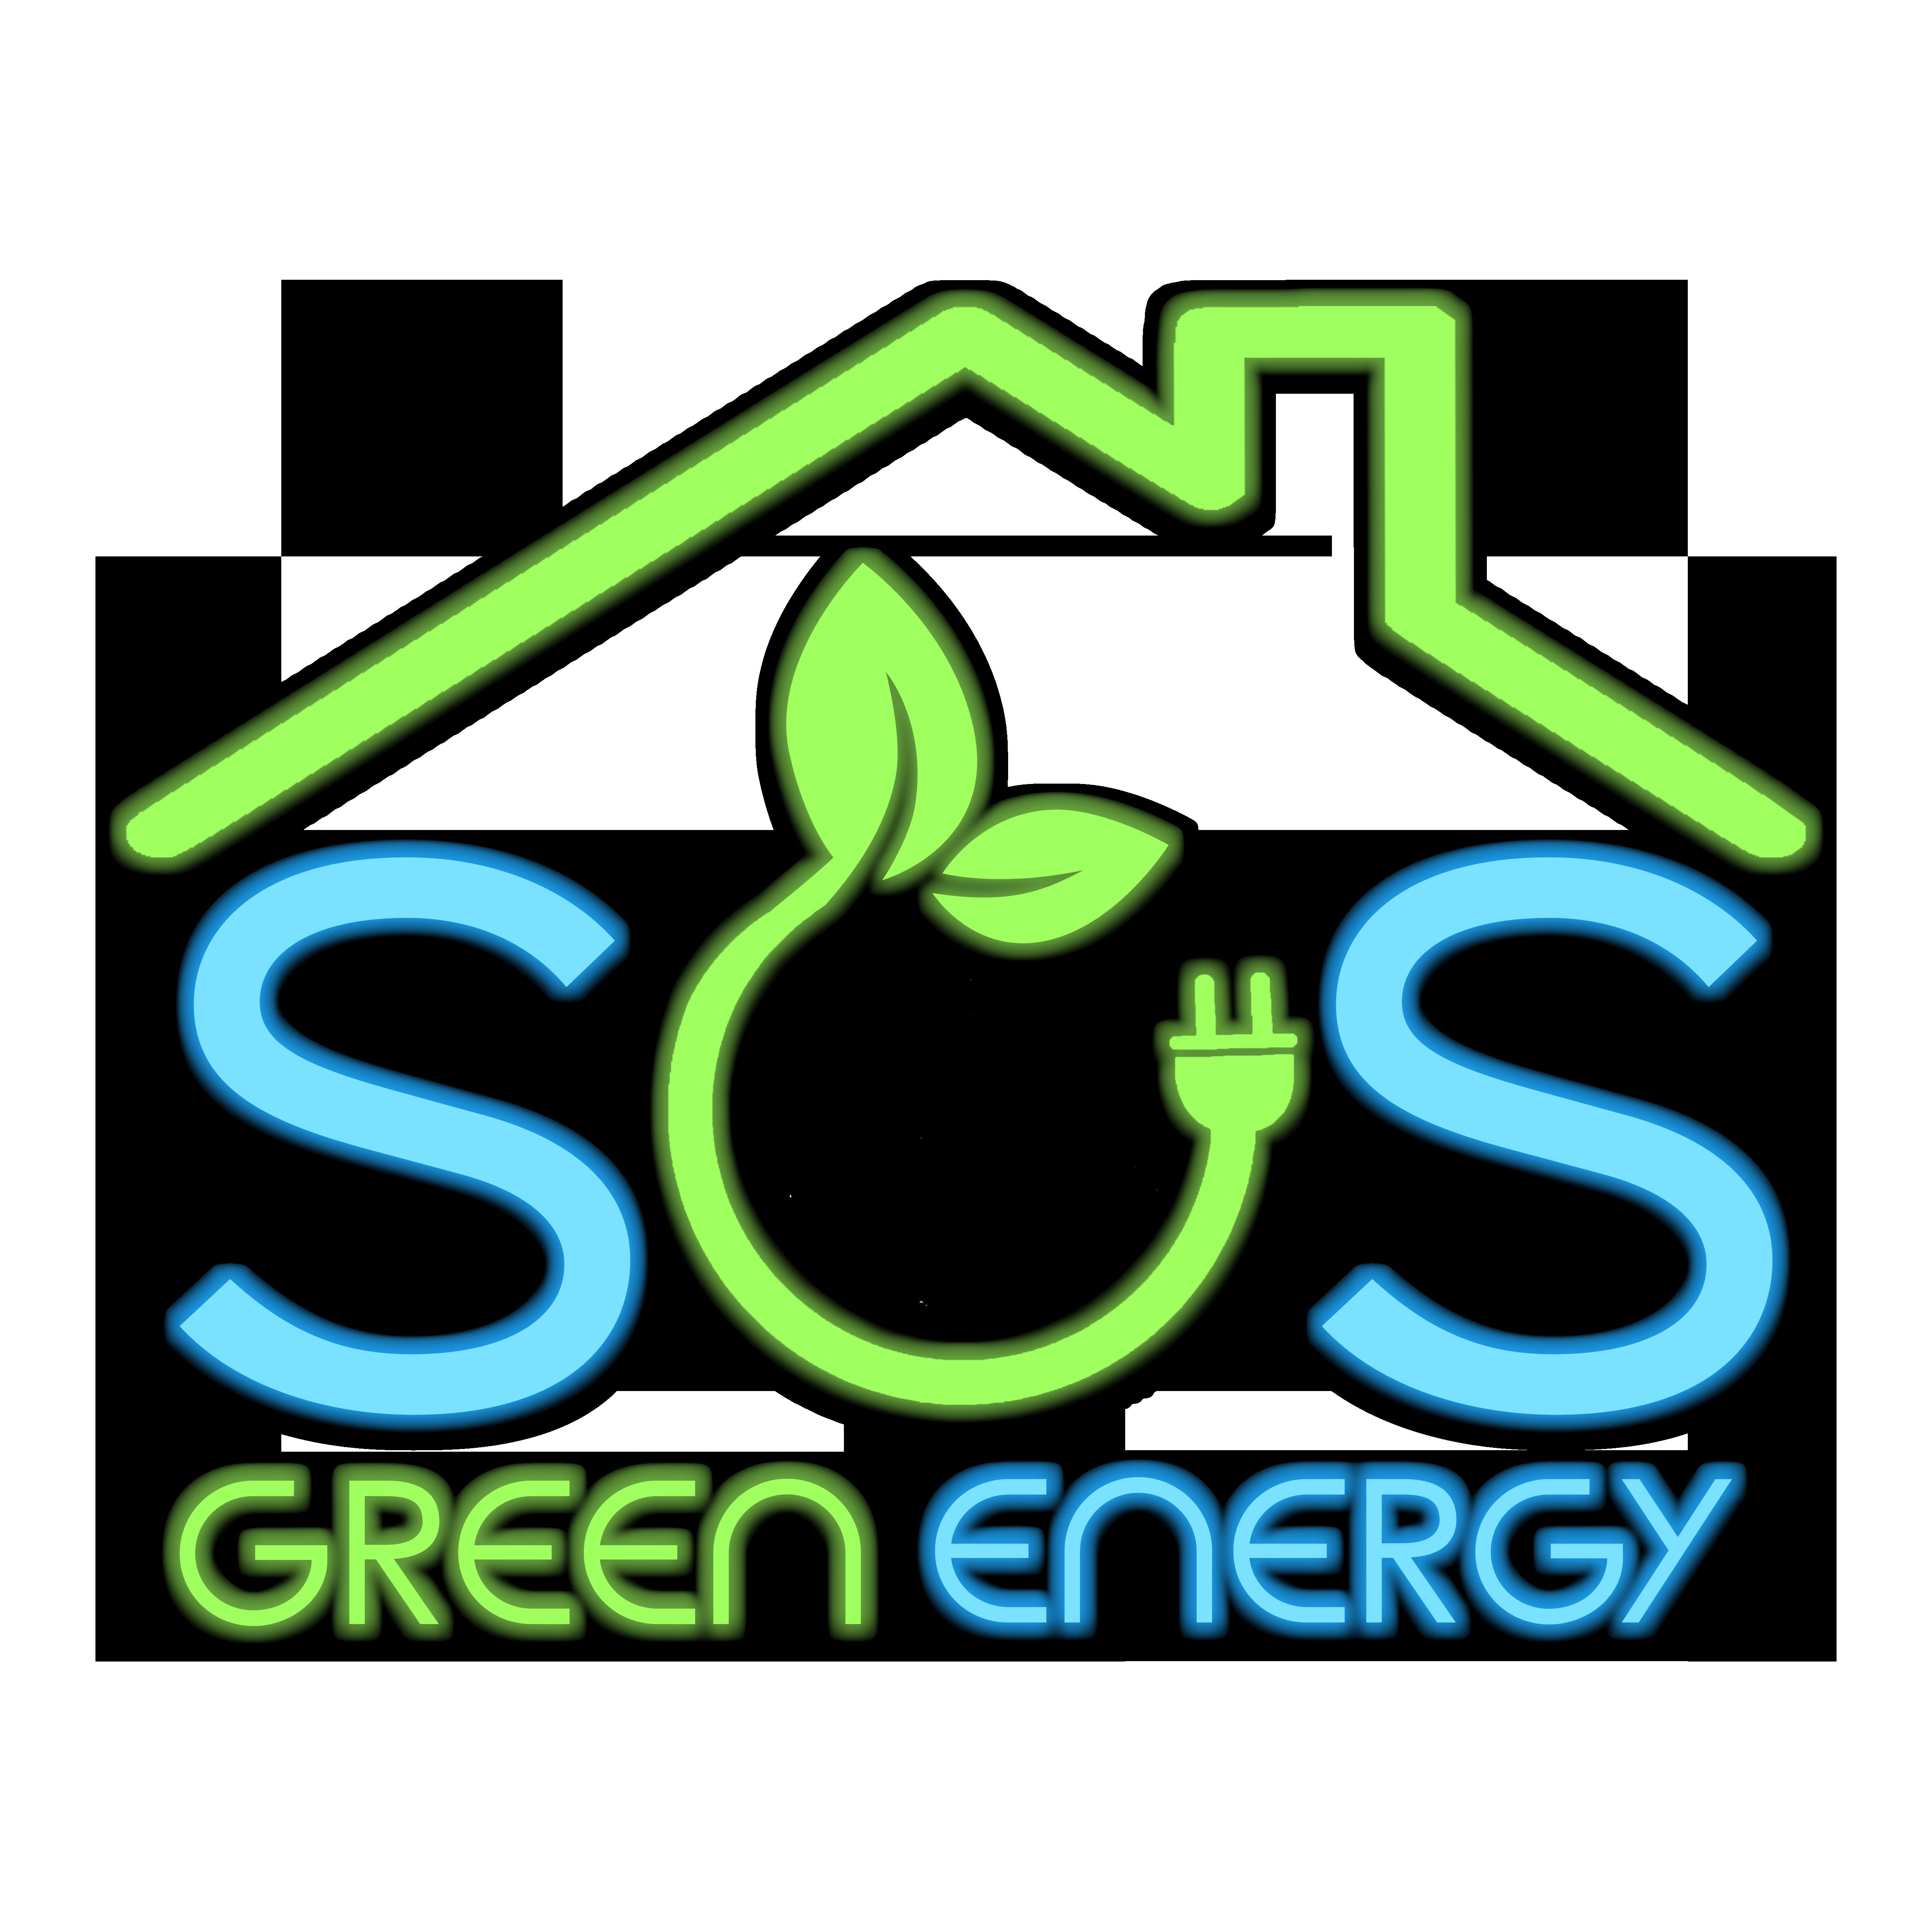 SoSGreenEnergy